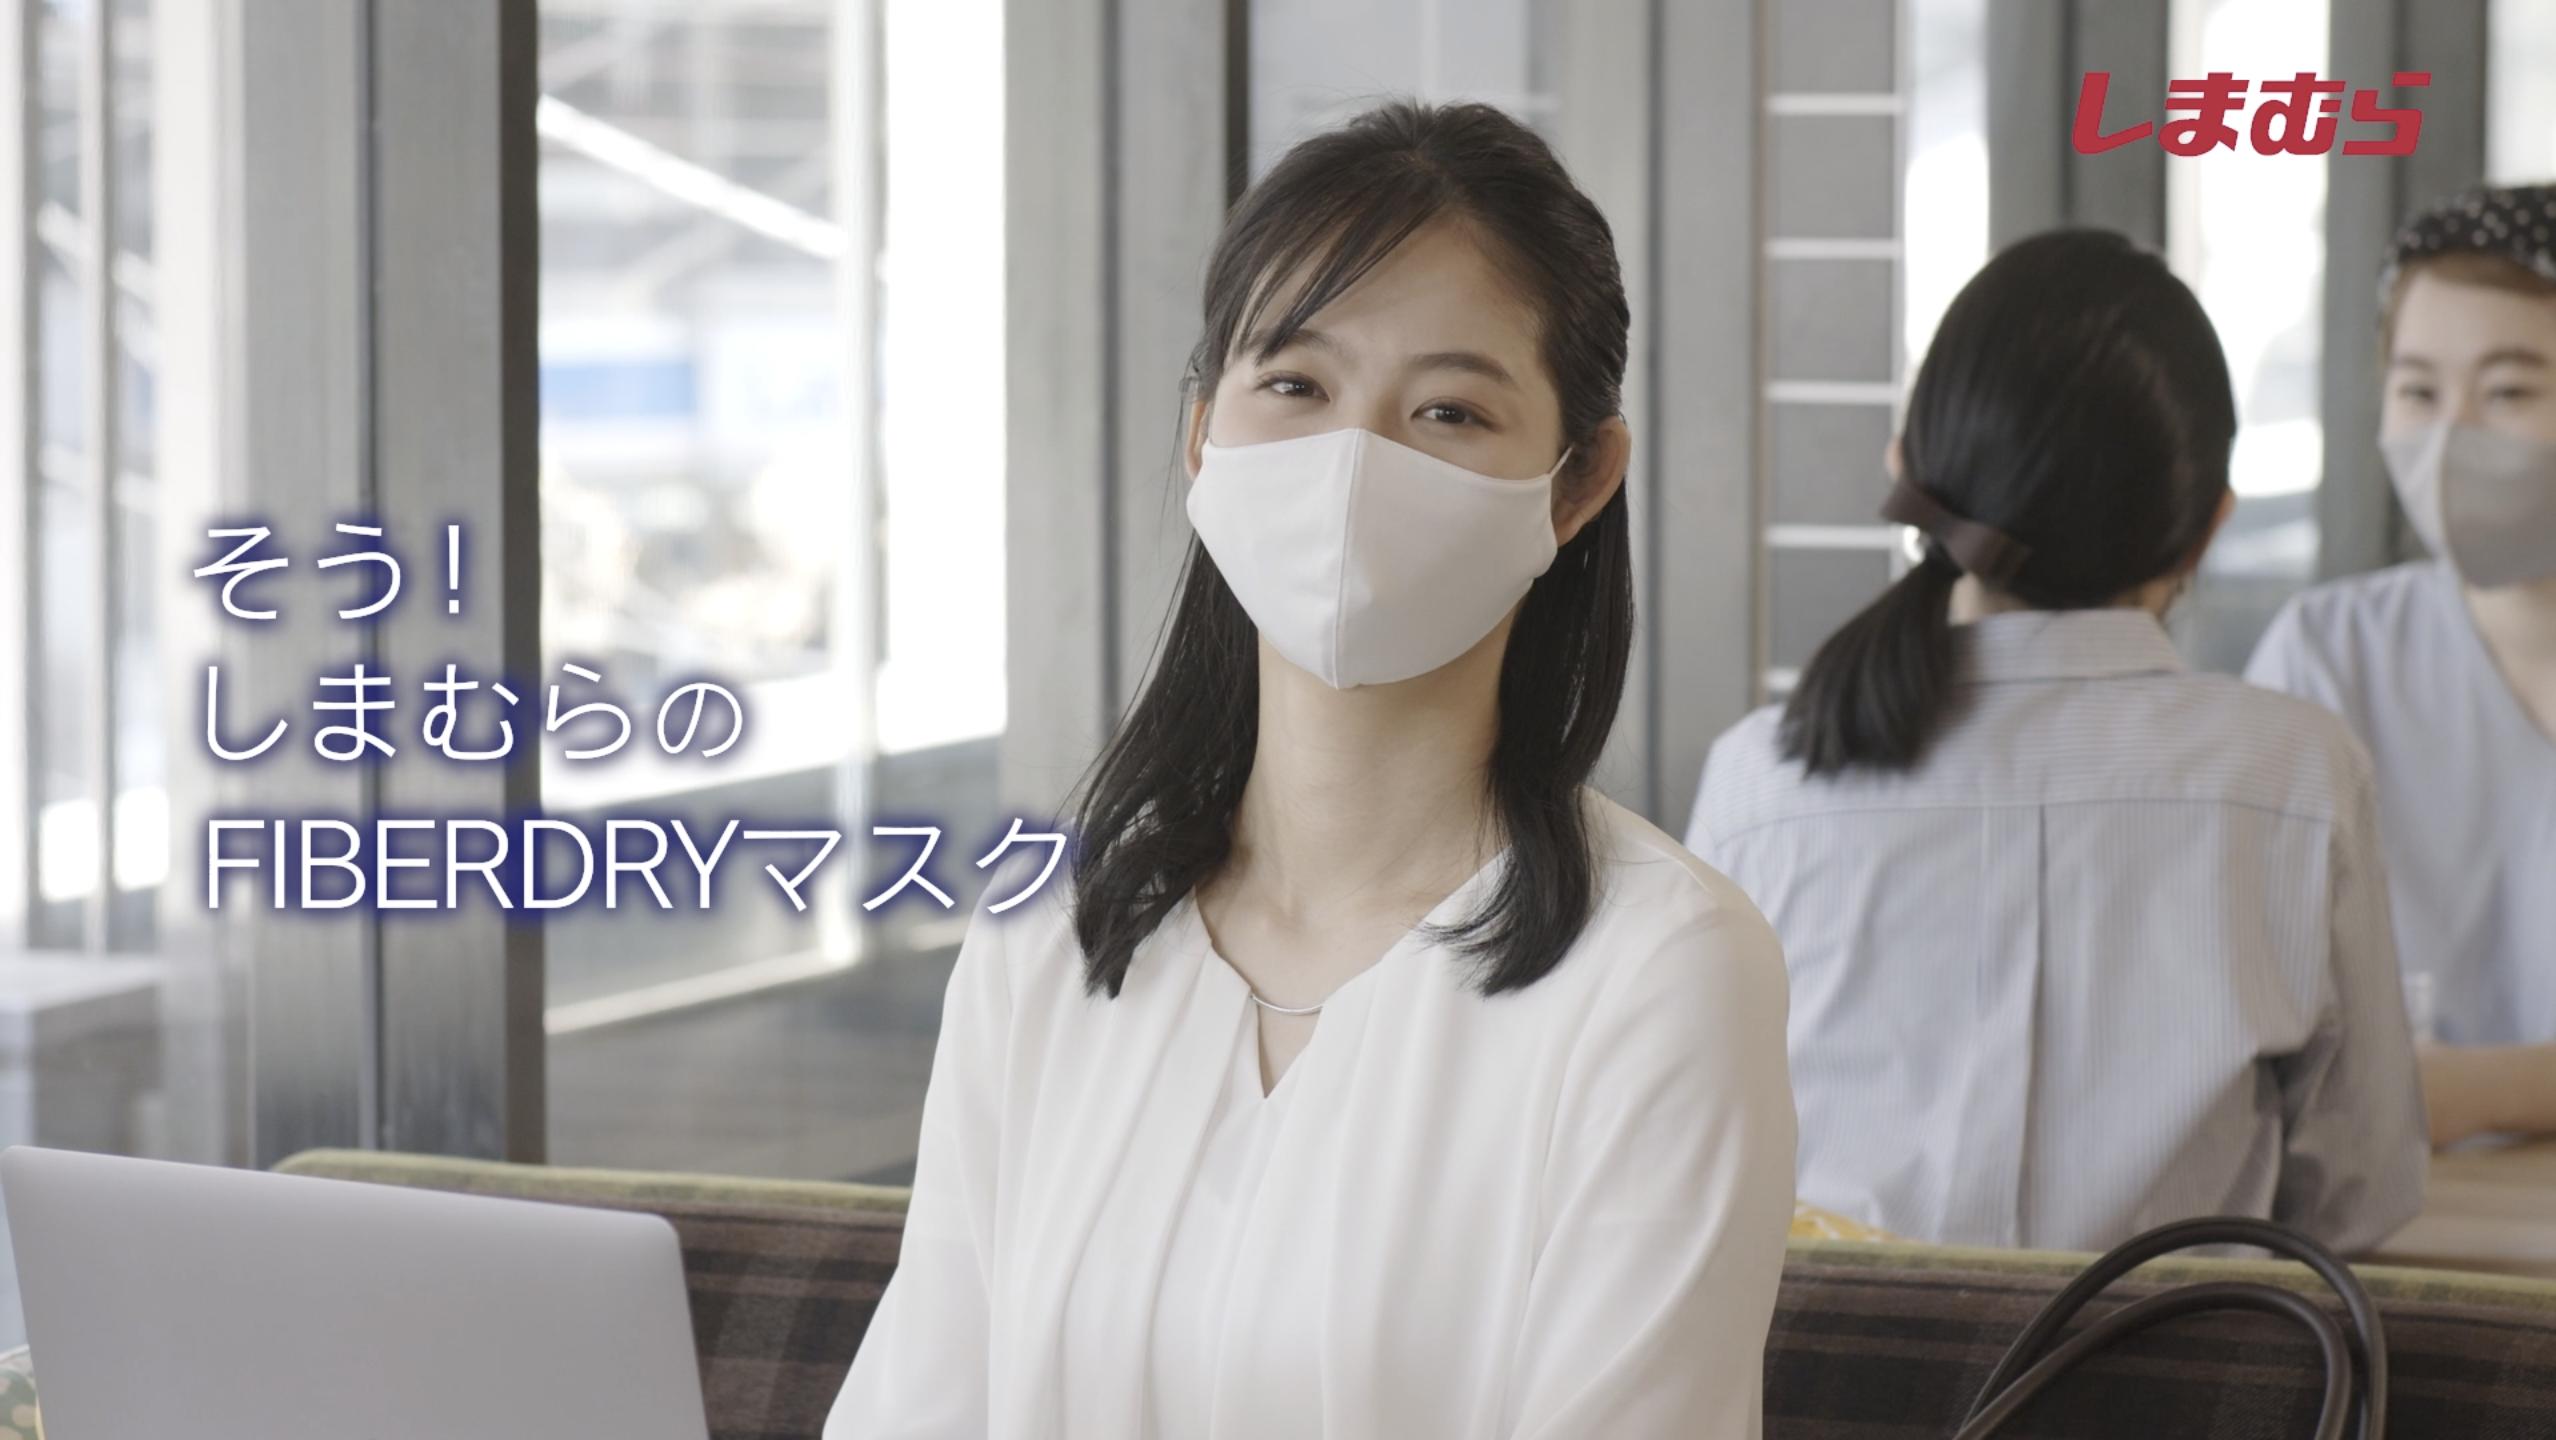 FIBERDRYマスク動画制作